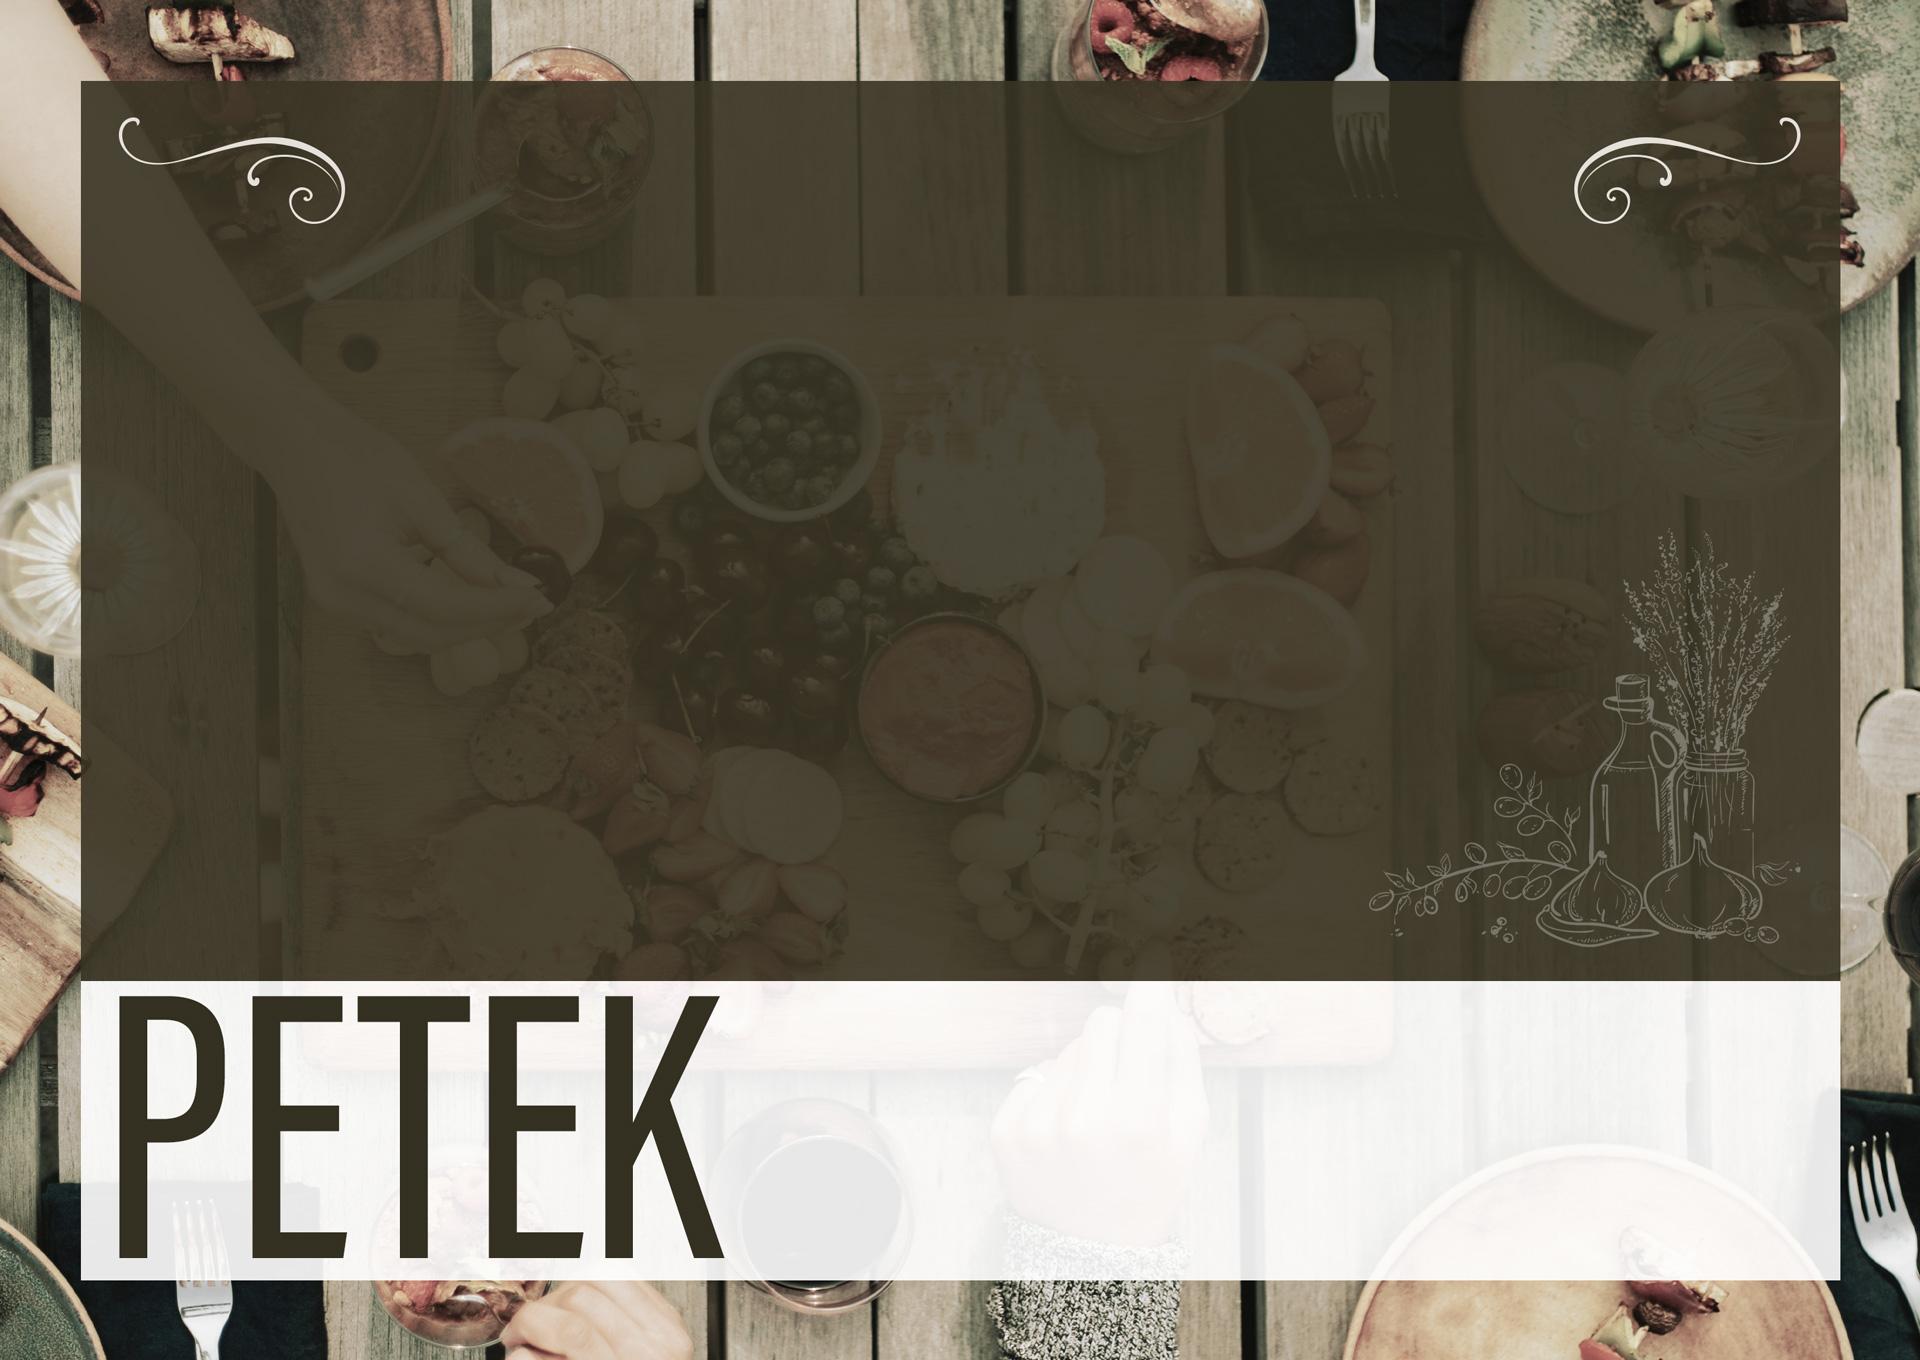 PETEK – 5.6.2020